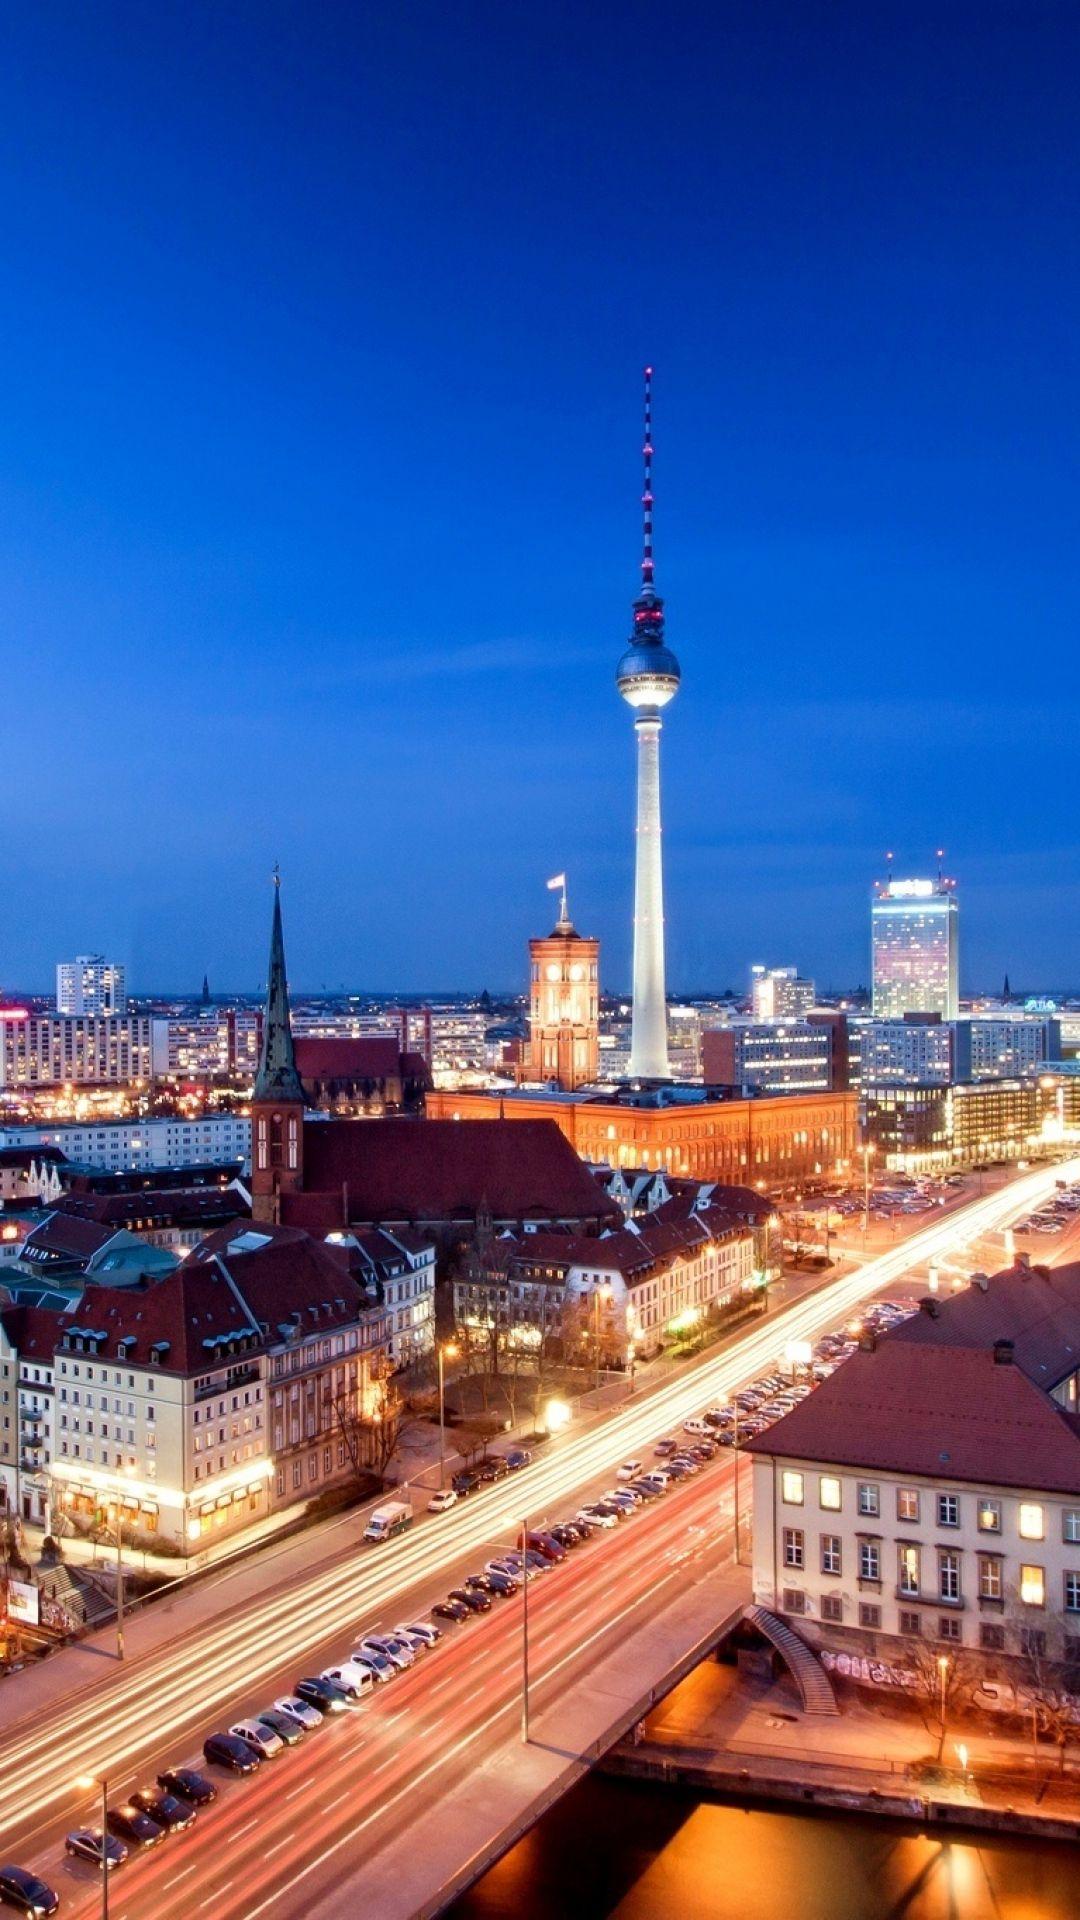 Alexanderplatz Berlin Capital Of Germany City Panorama Night Evening House Building Architecture Tow Reisen Stadte Reise Stadtereise Berlin